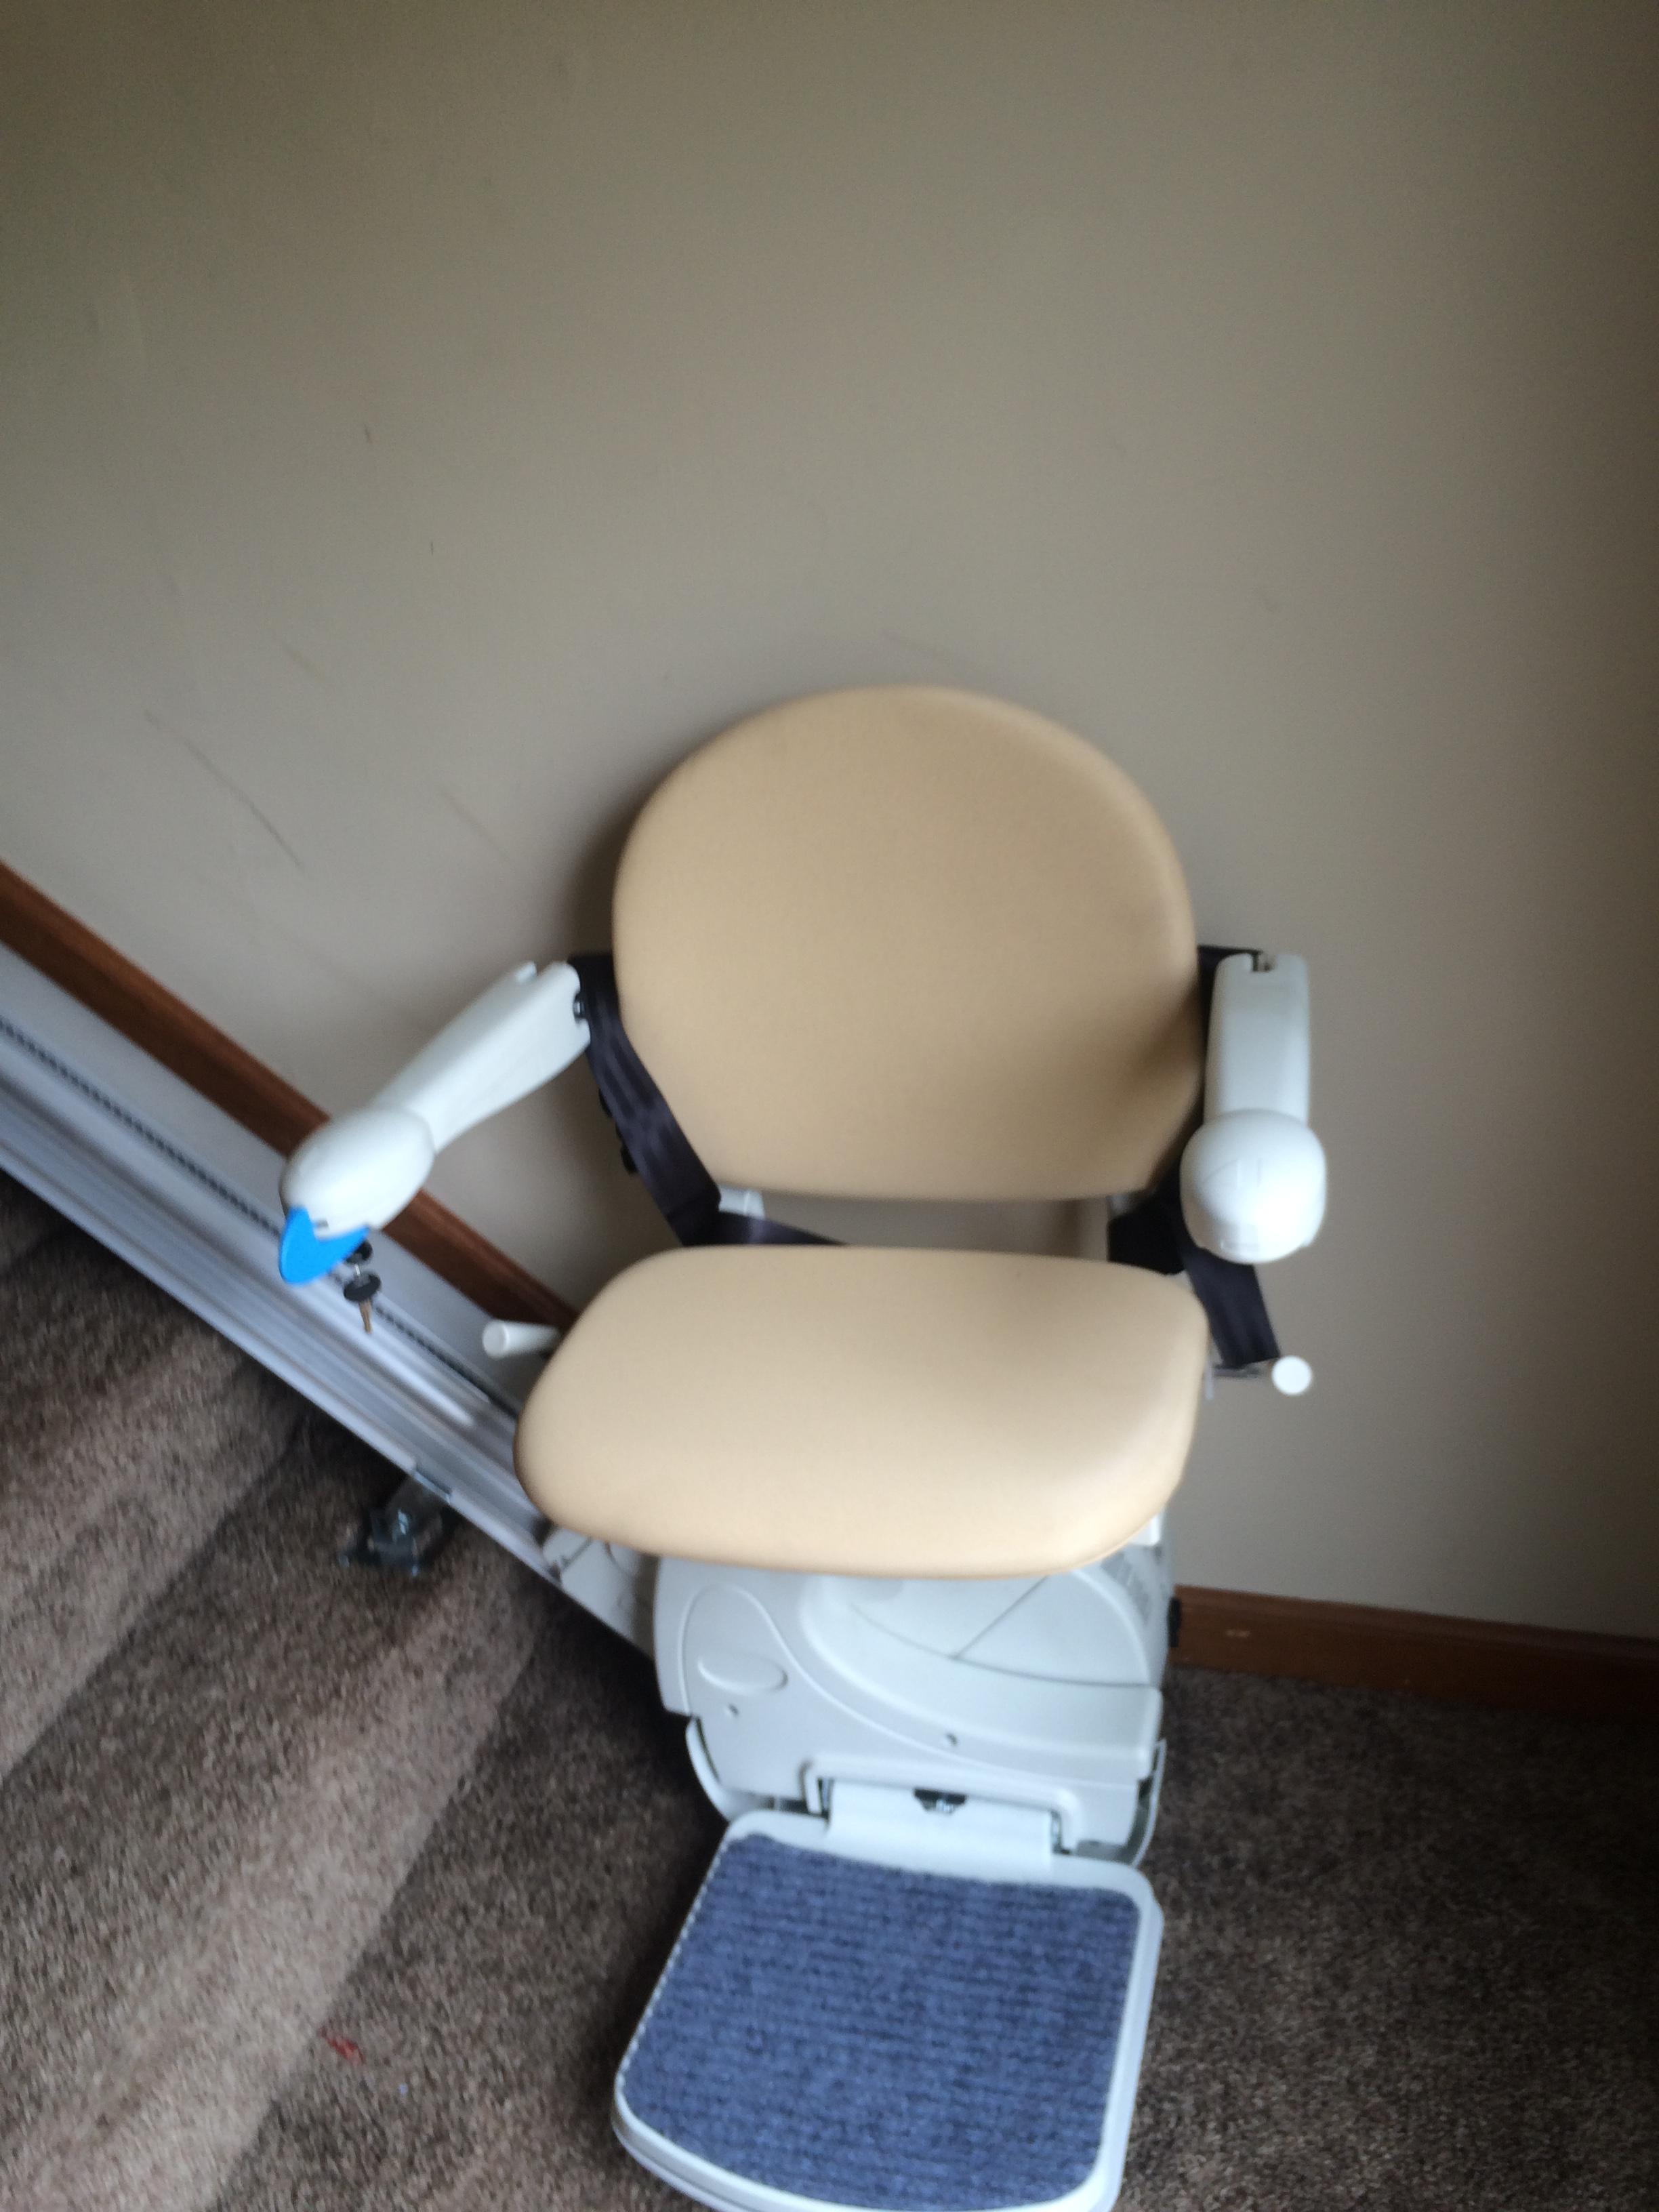 Handicare 950 Stairlift